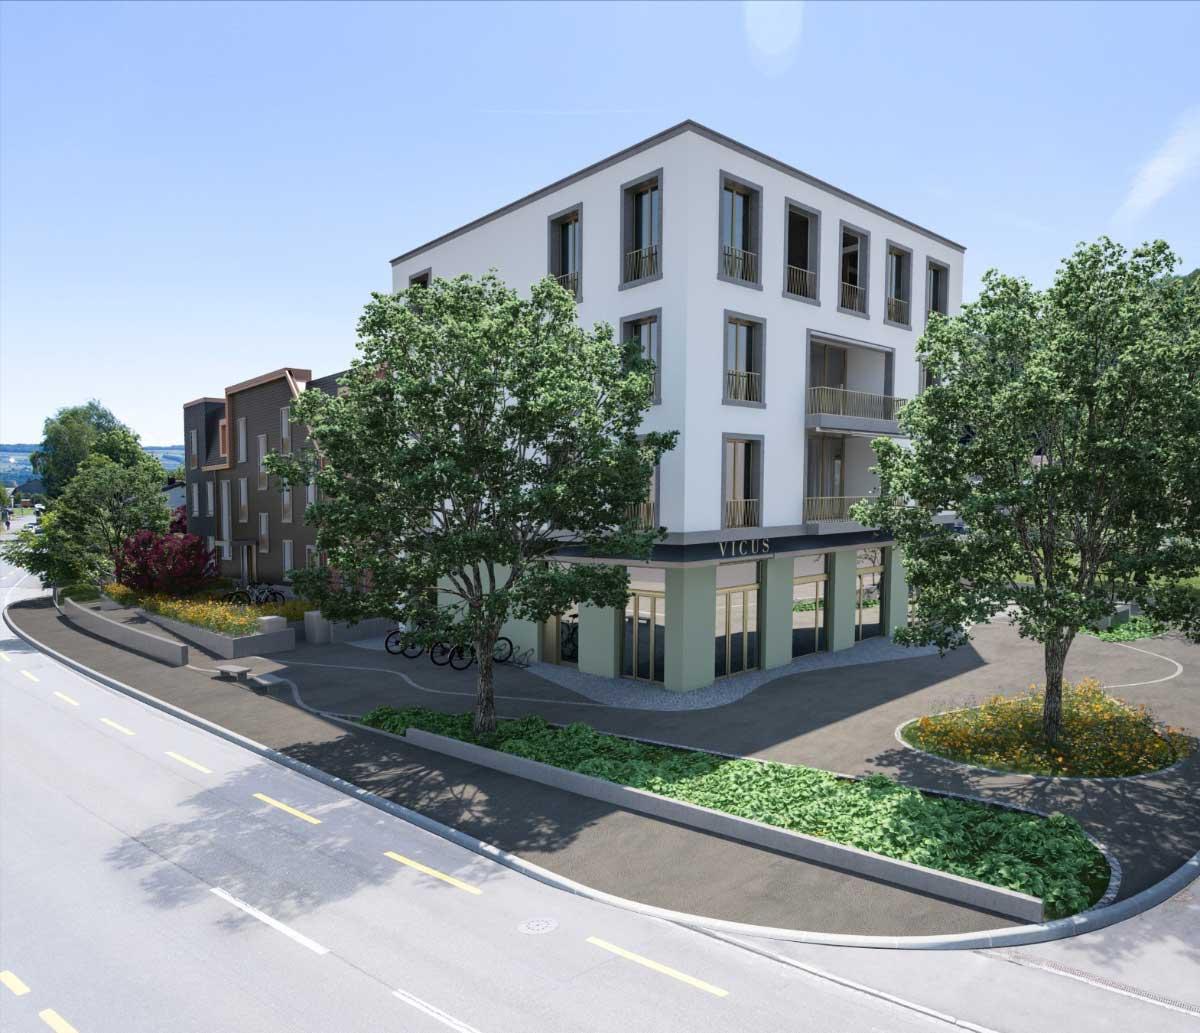 Dorfplatz-hunziker-architekten-Wohnbau